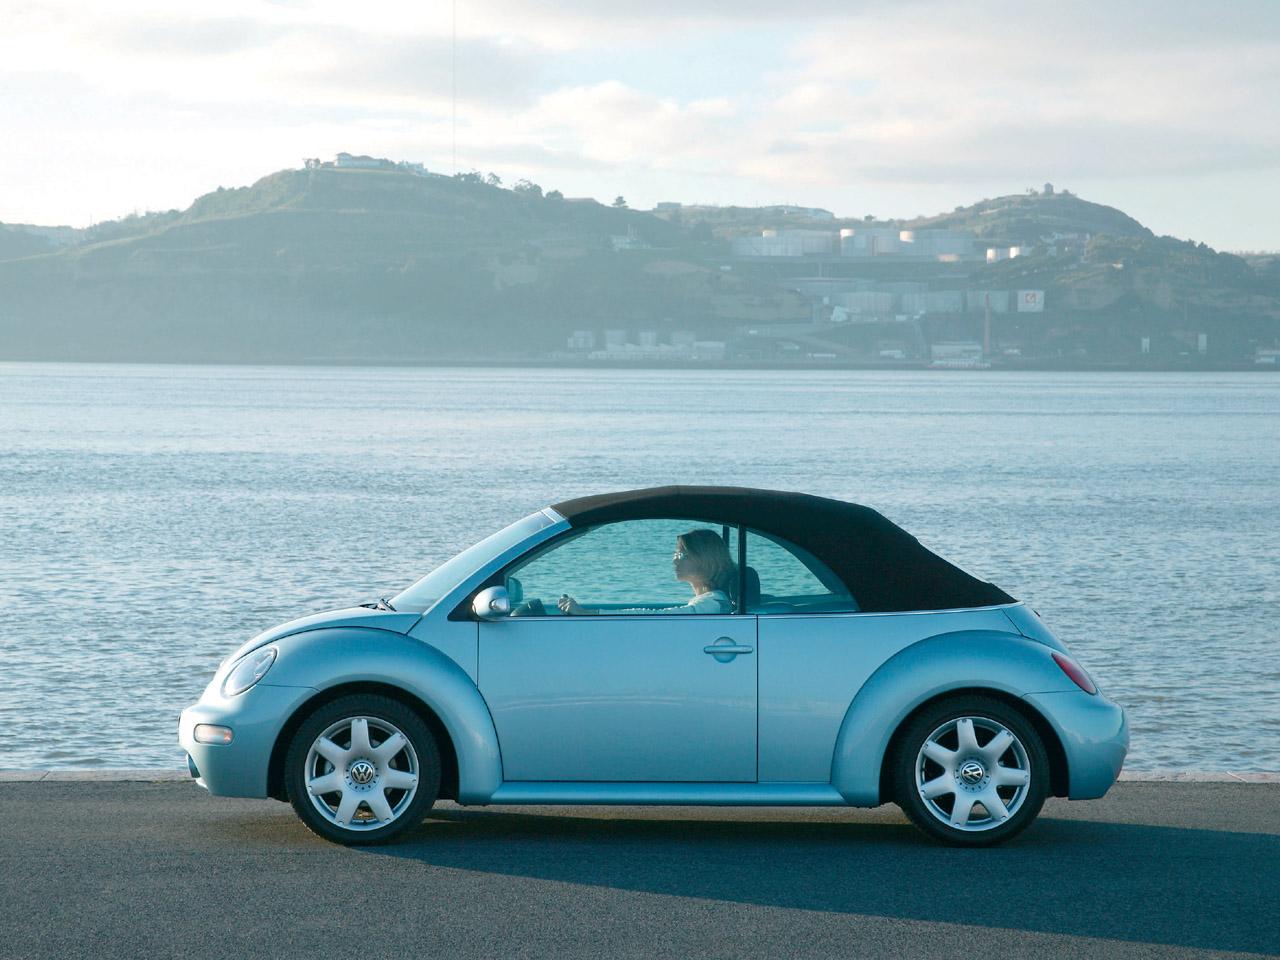 2003 Volkswagen New Beetle - Information And Photos